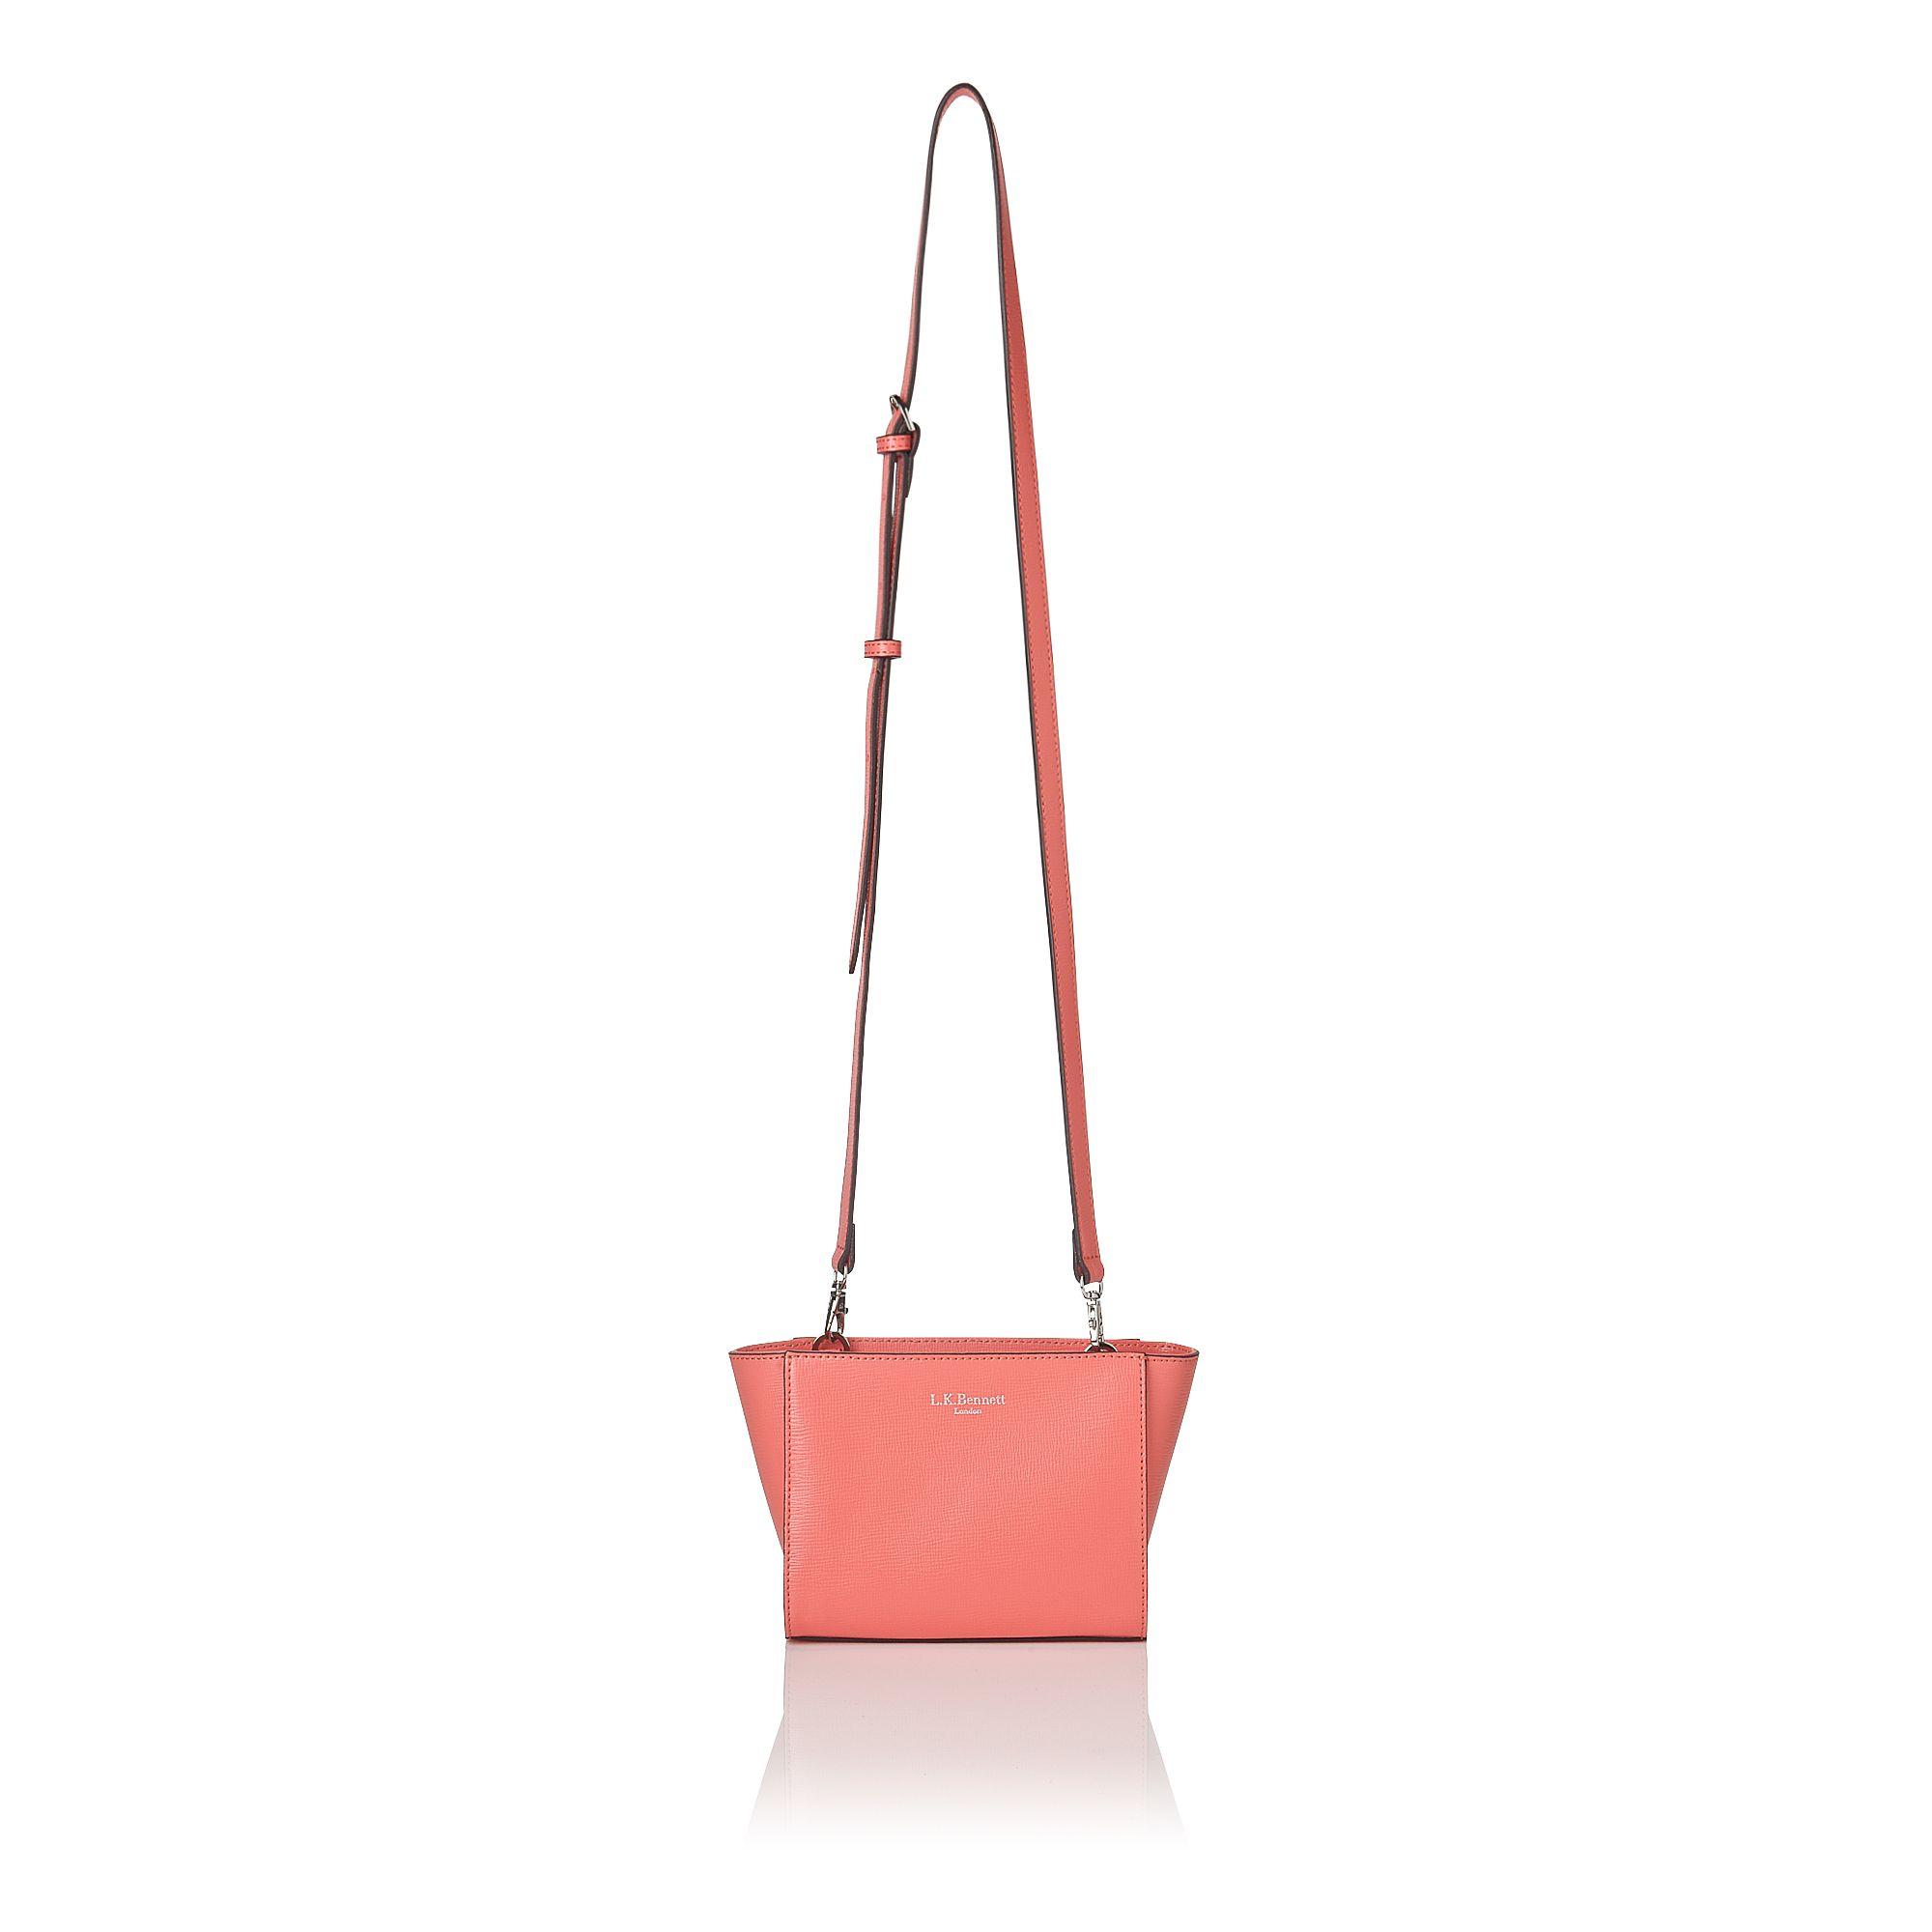 L.K.Bennett Kaylee Crossbody Bag in Pink